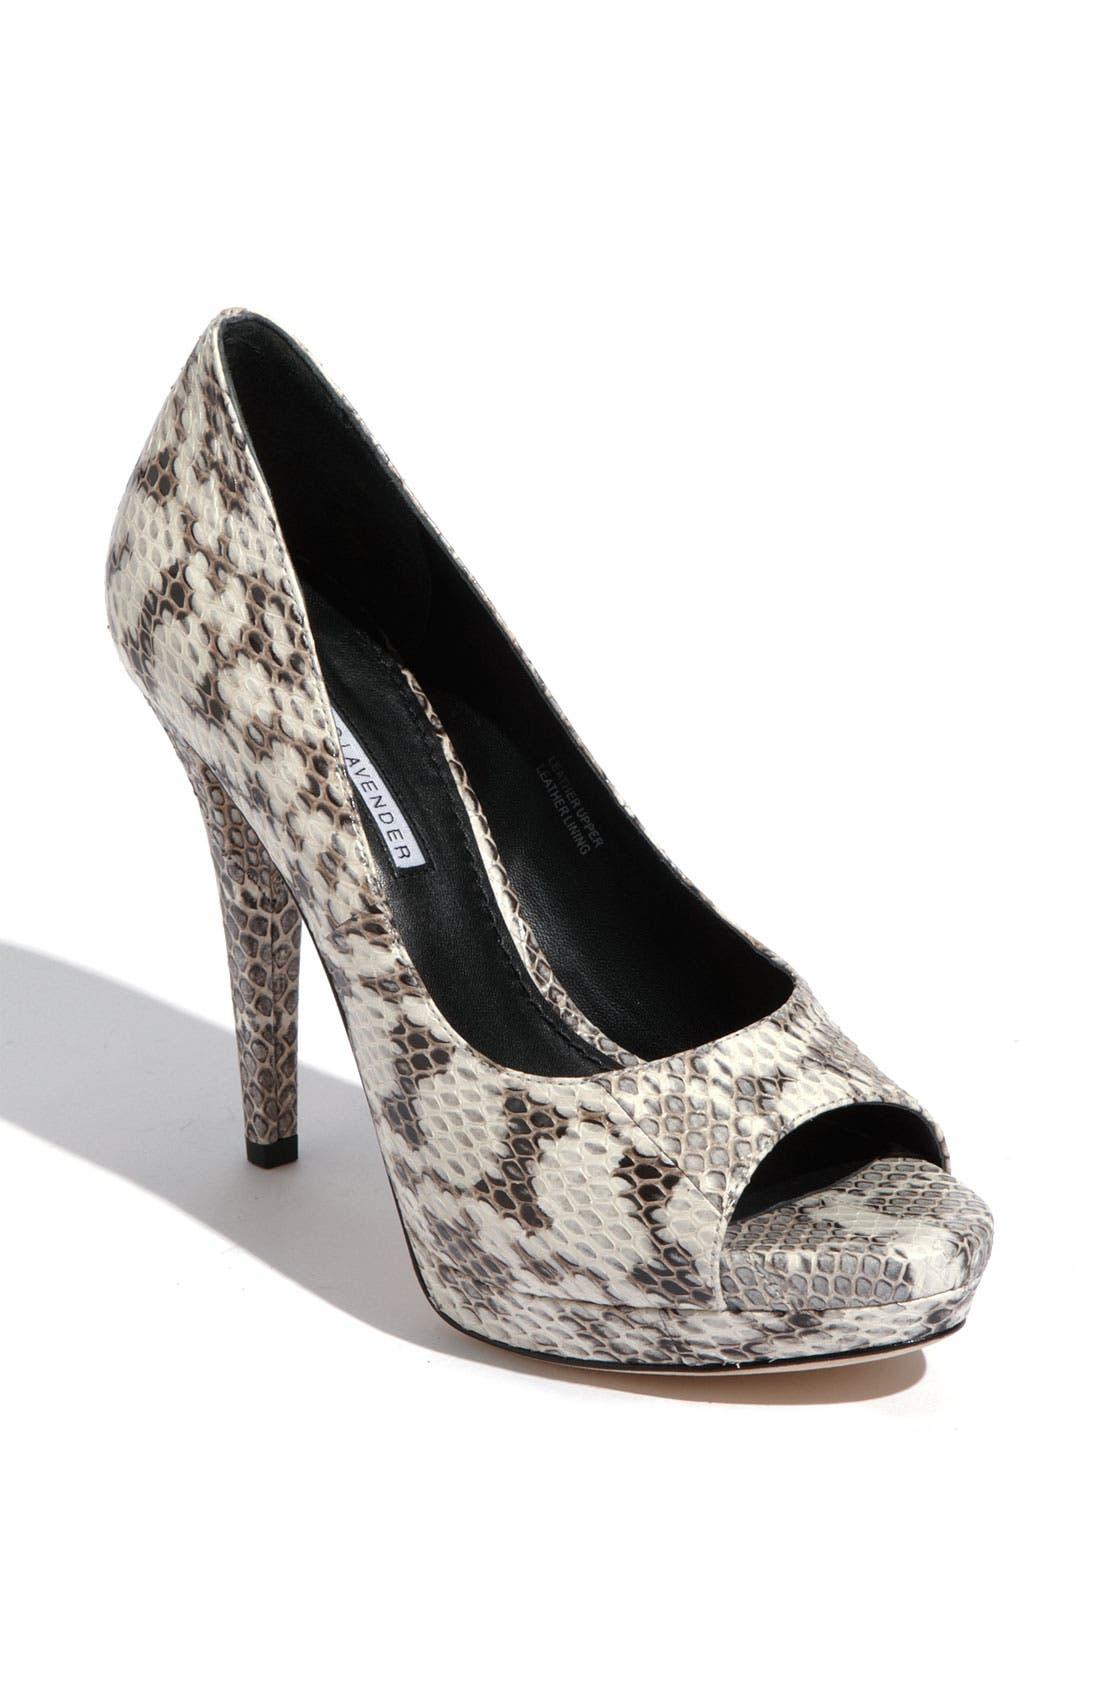 Footwear 'Selima' Peep Toe Pump,                             Main thumbnail 4, color,